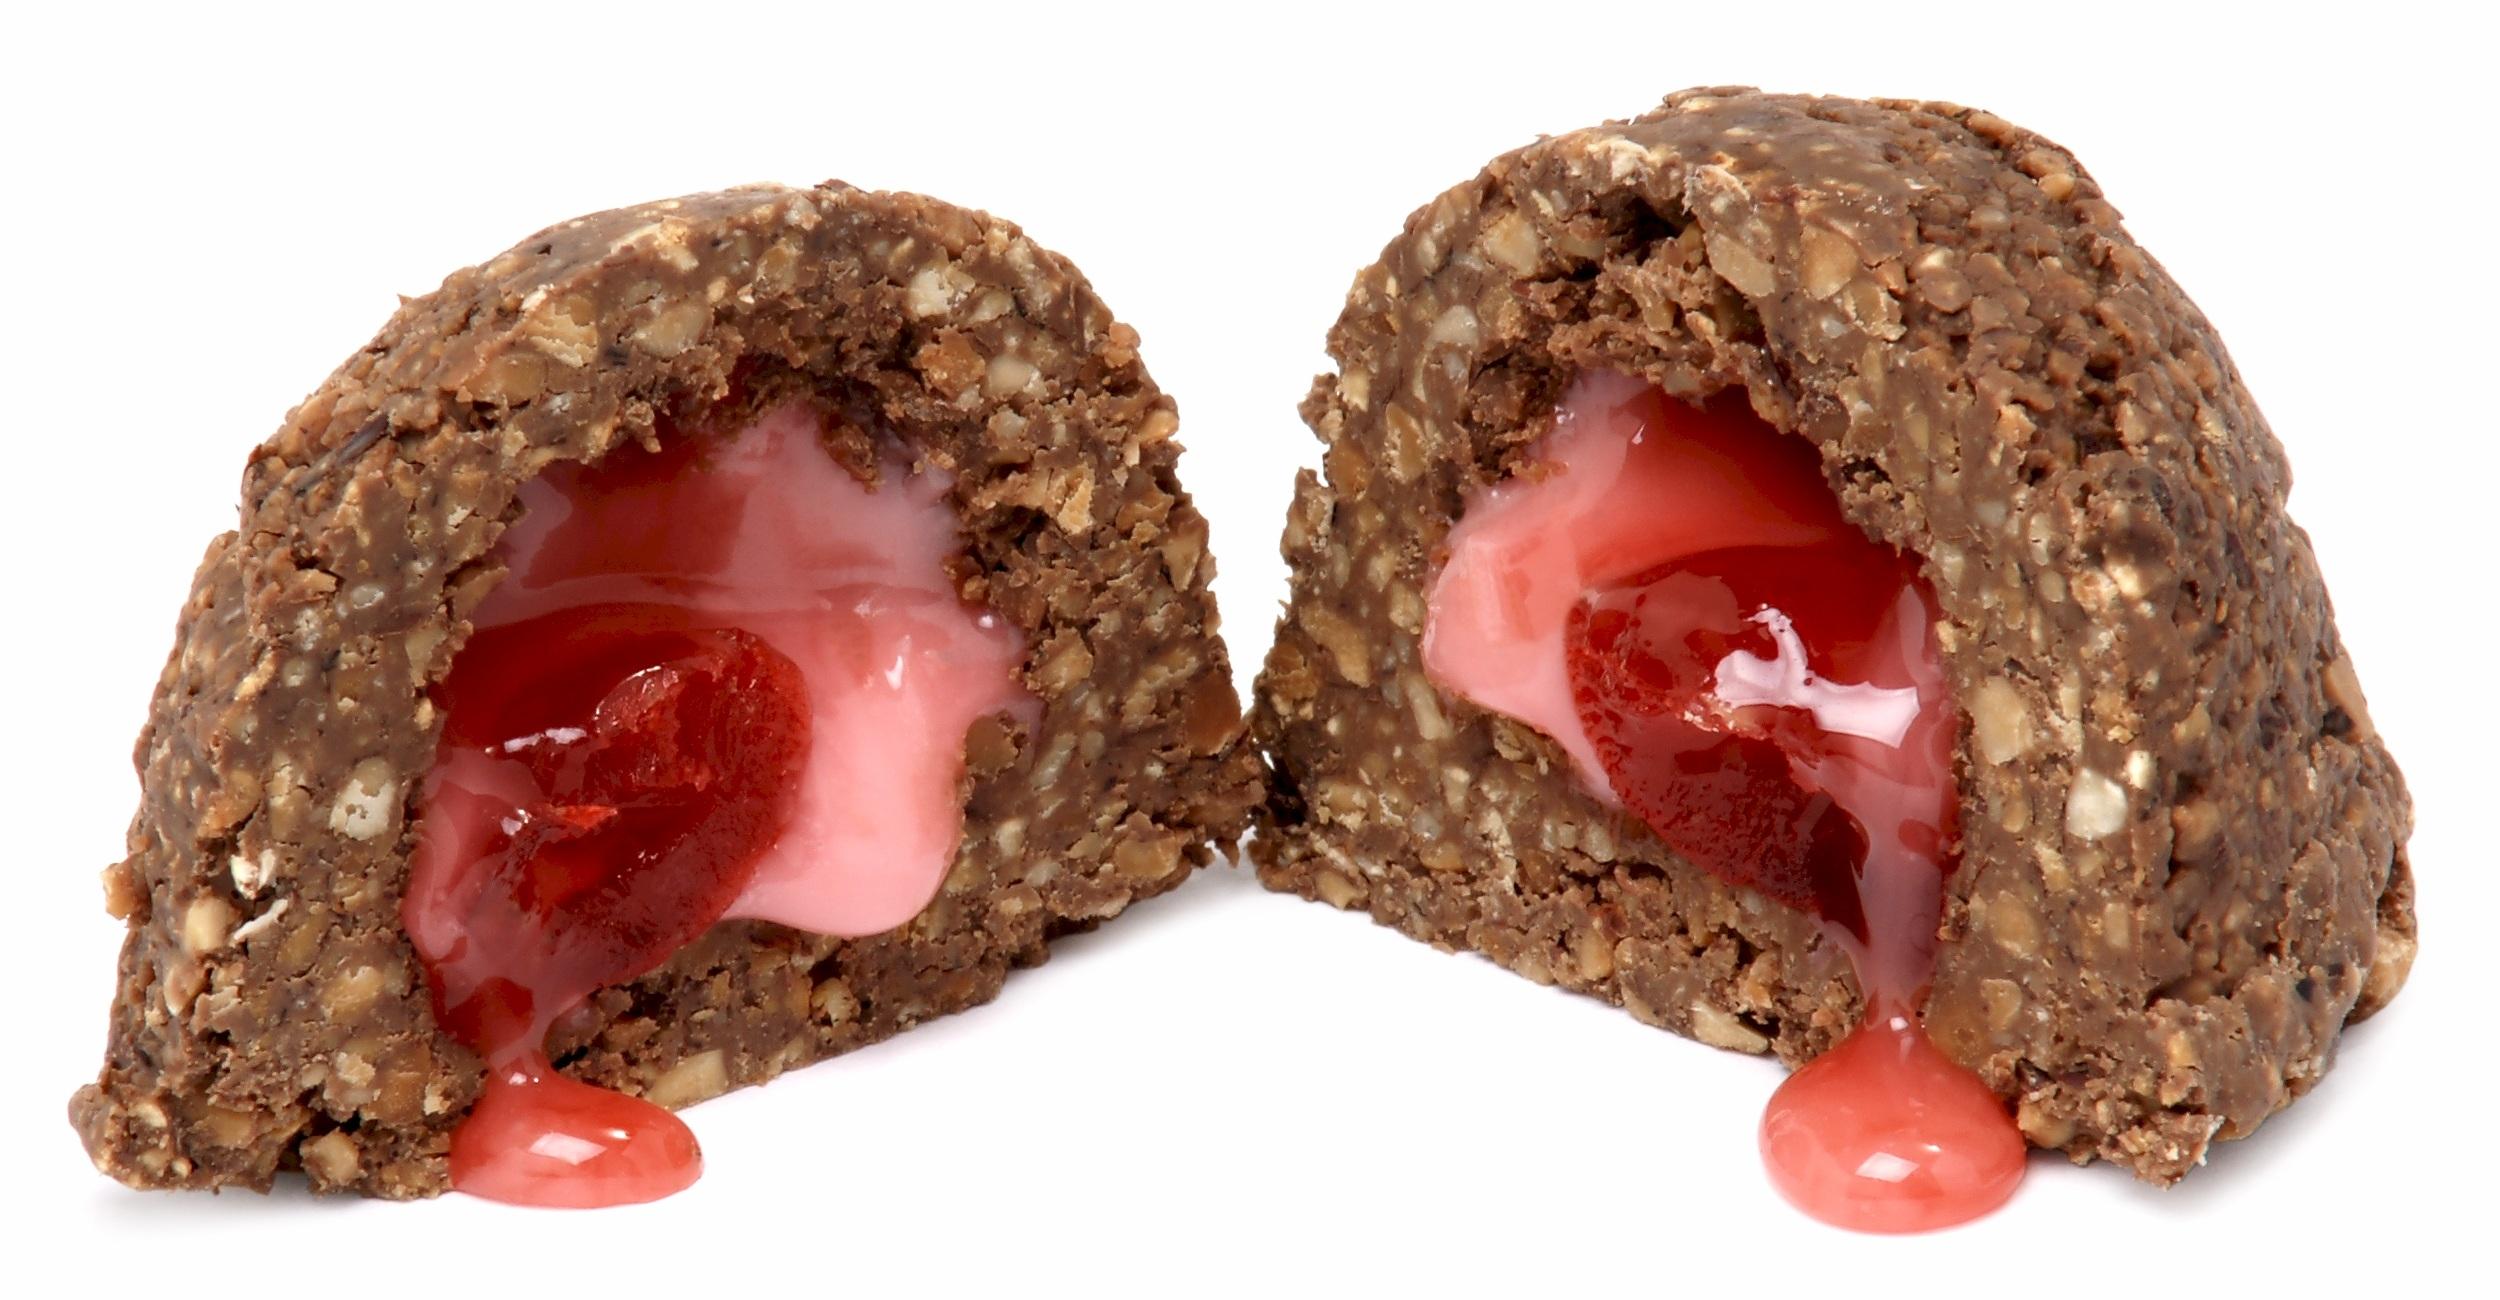 Cherry candy photo